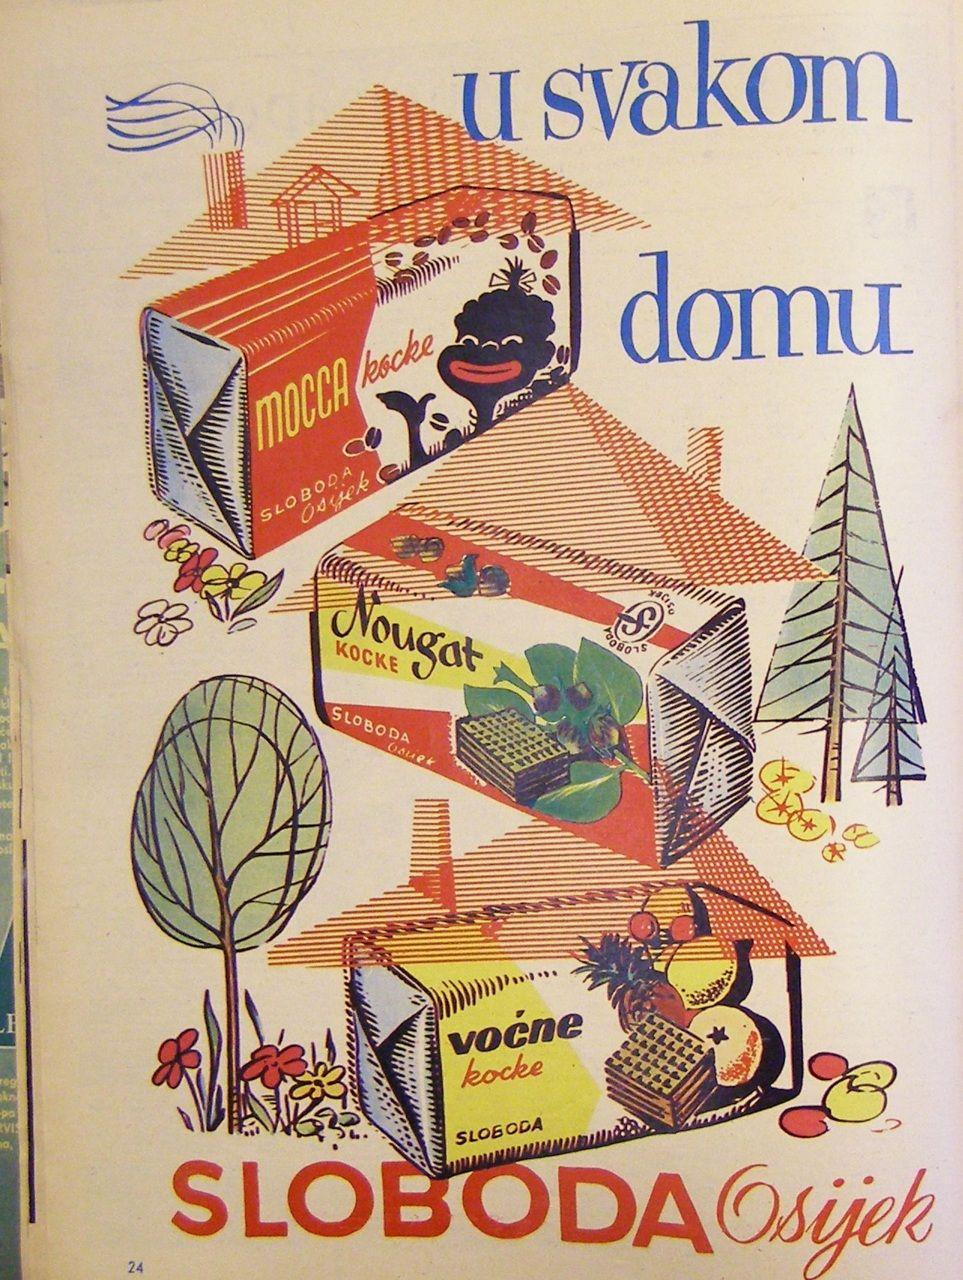 Pin By Bojan Cvetanovic On Yugoslav Design Retro Travel Poster Vintage Advertising Posters Book Artwork